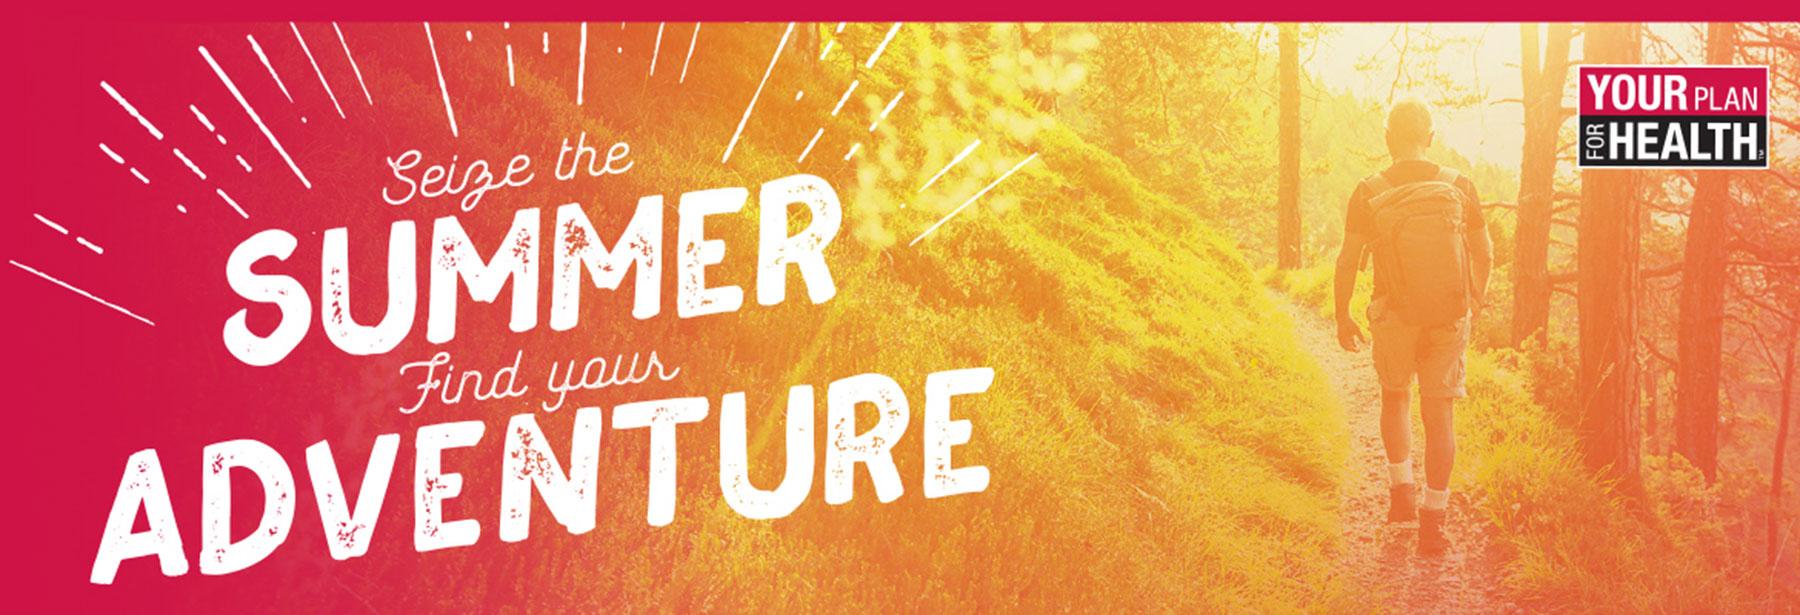 Seize the Summer logo